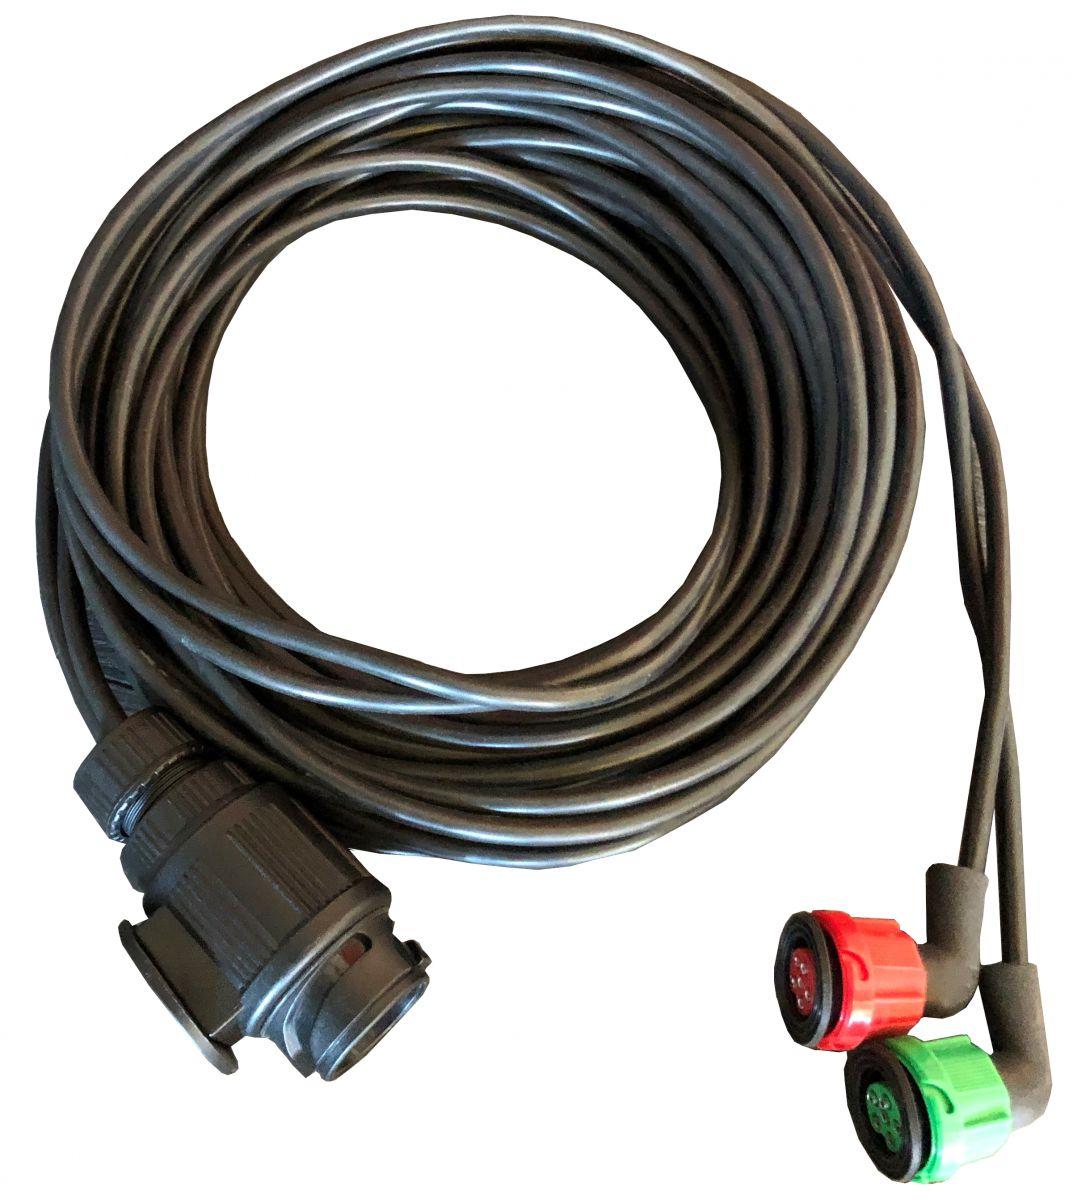 kabelsatz 13 p radex 8m